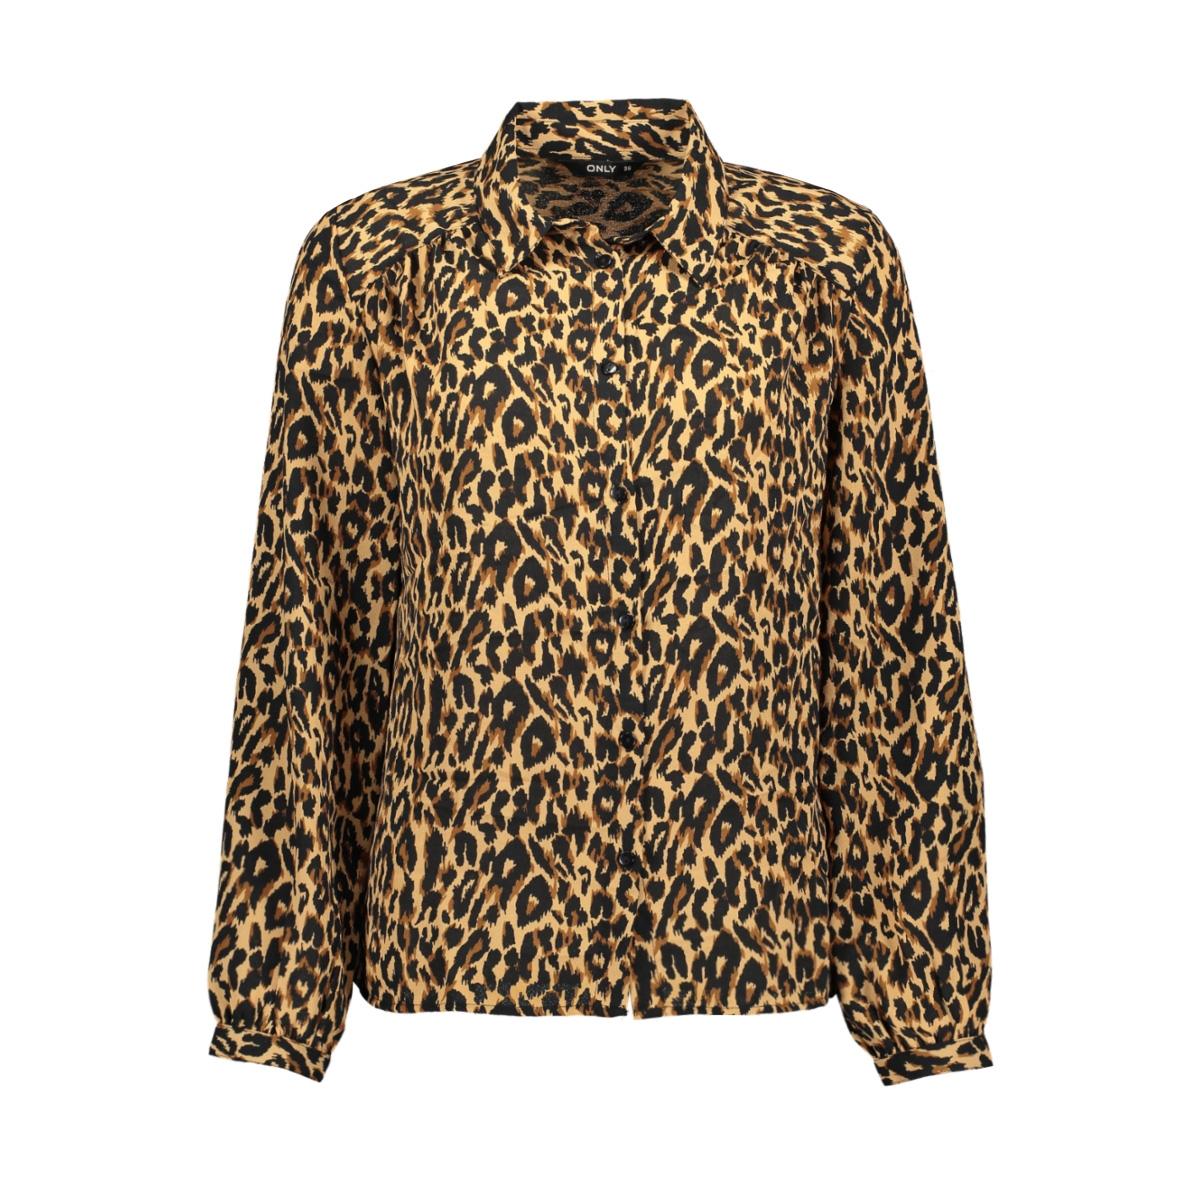 onldemi l/s shirt wvn 15186411 only blouse bone brown/dandy leo